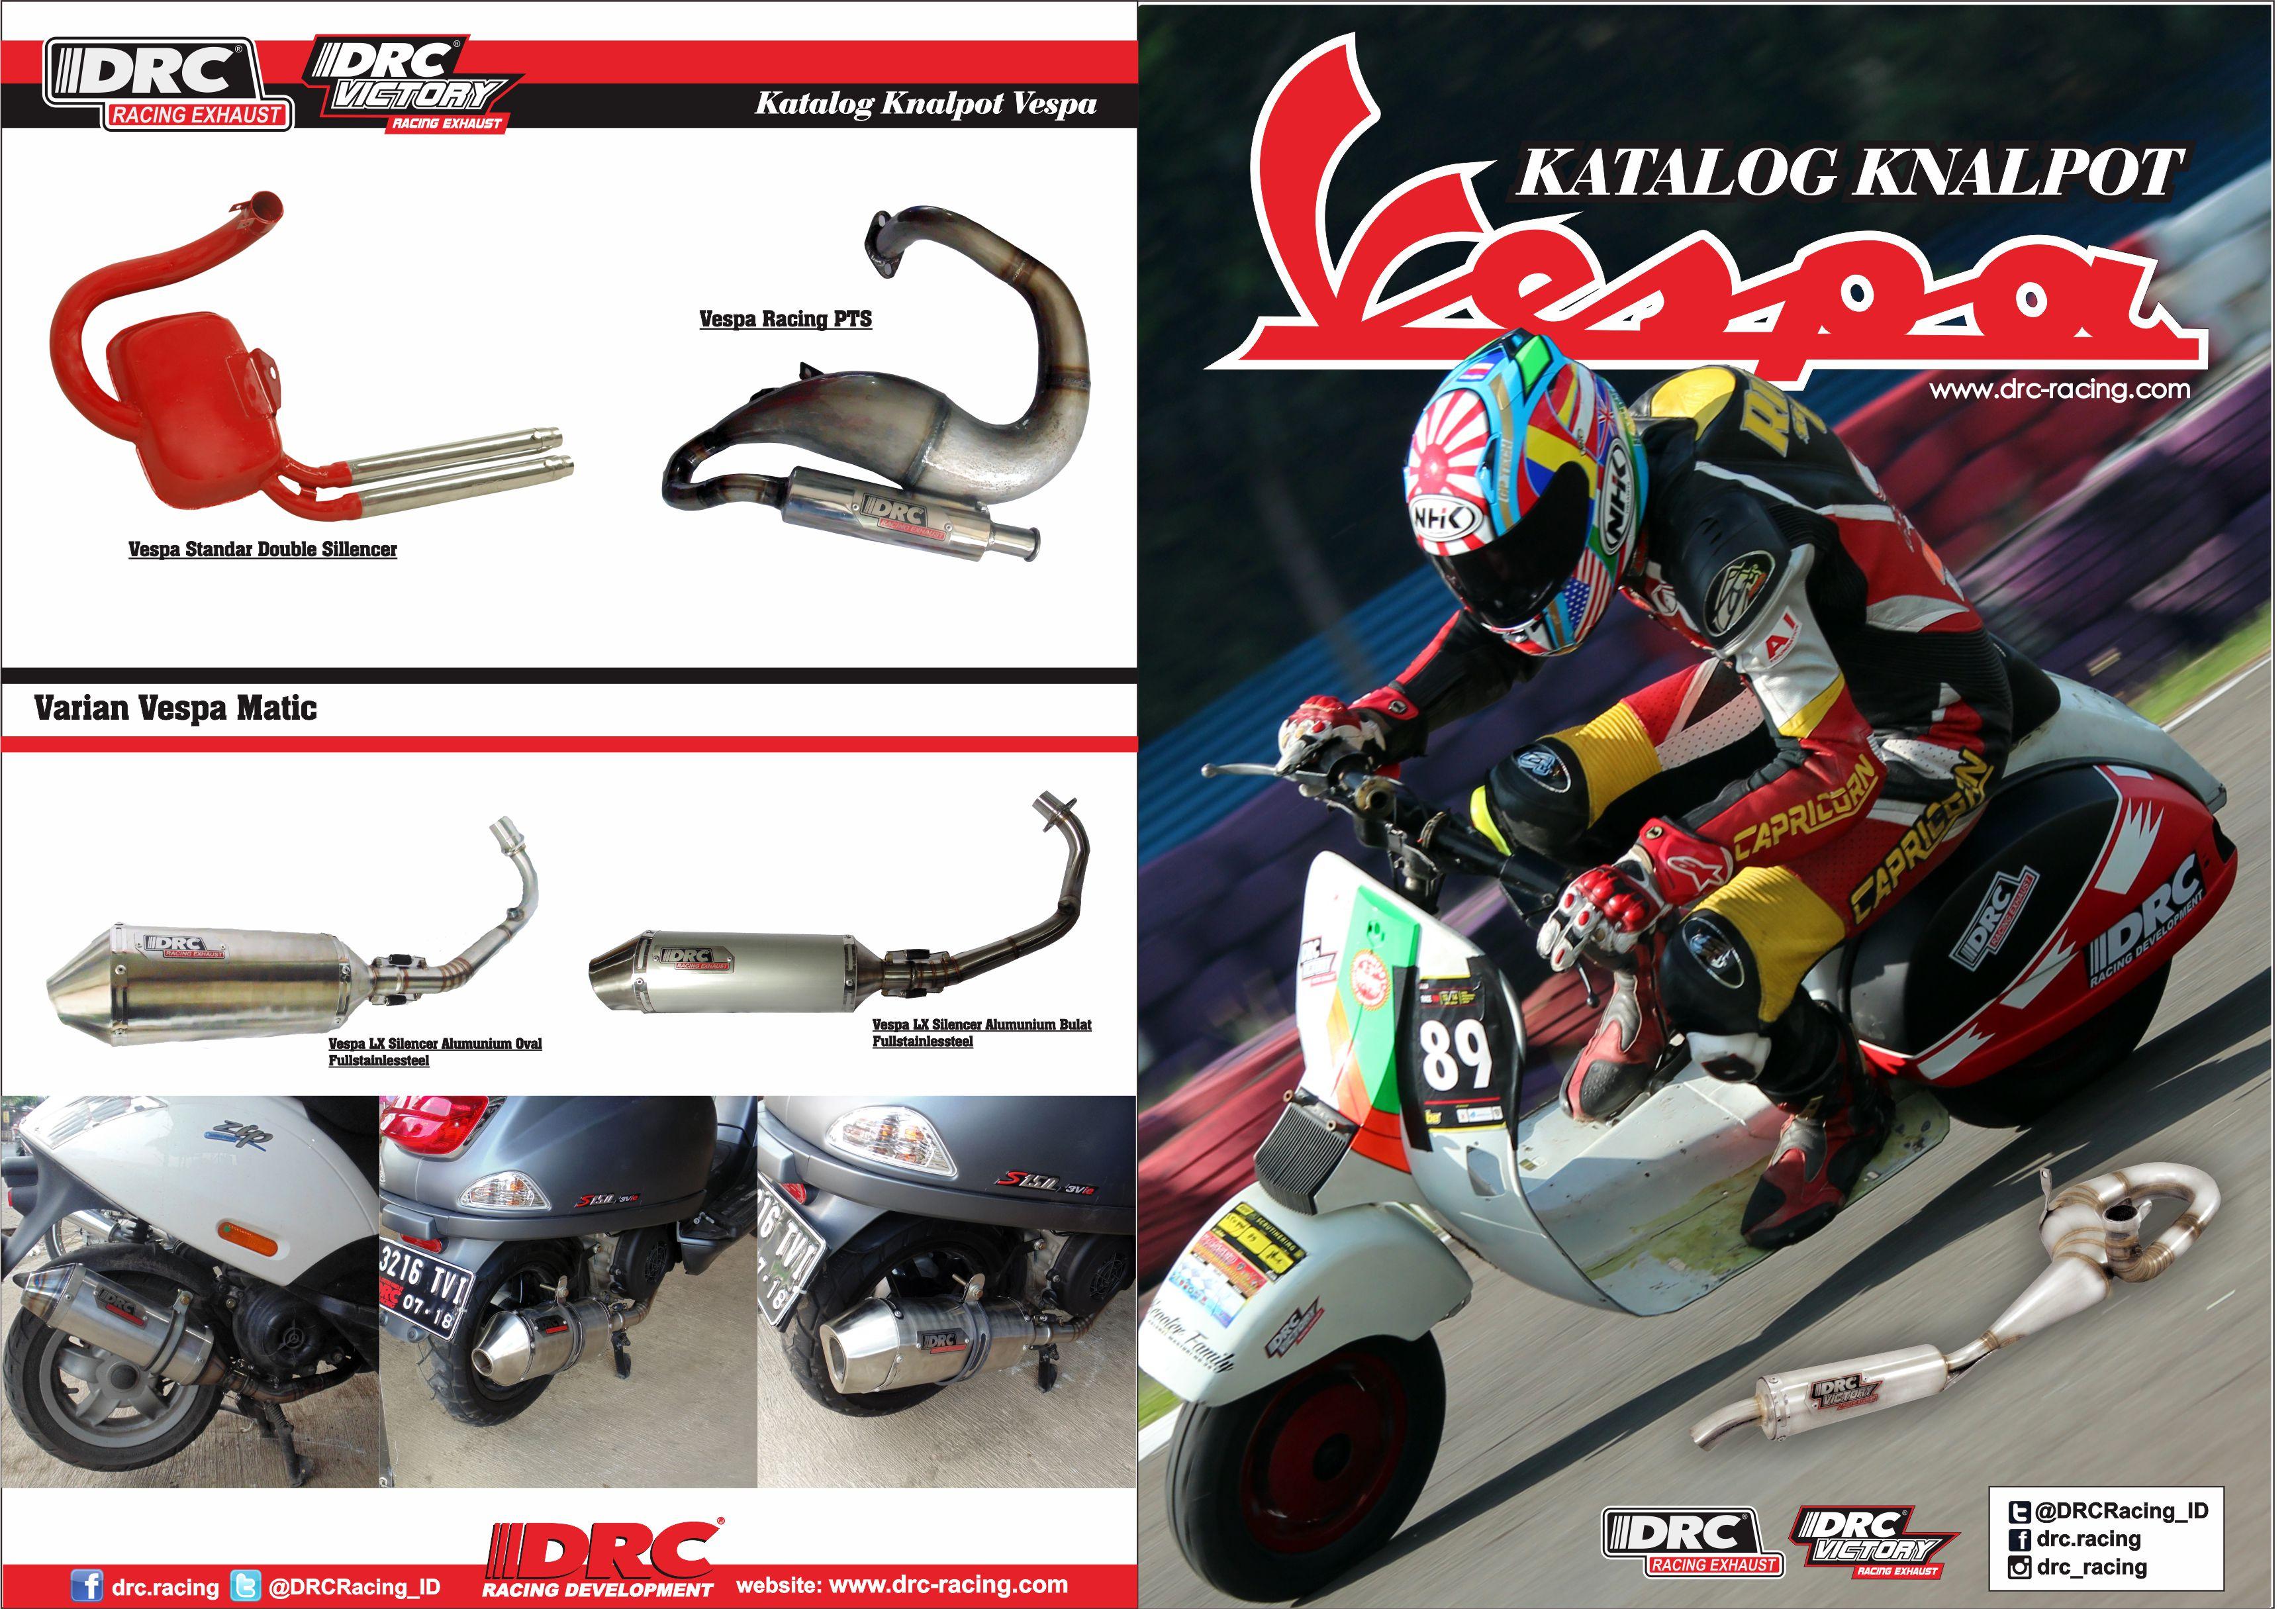 Katalog knalpot vespa drc racing 1